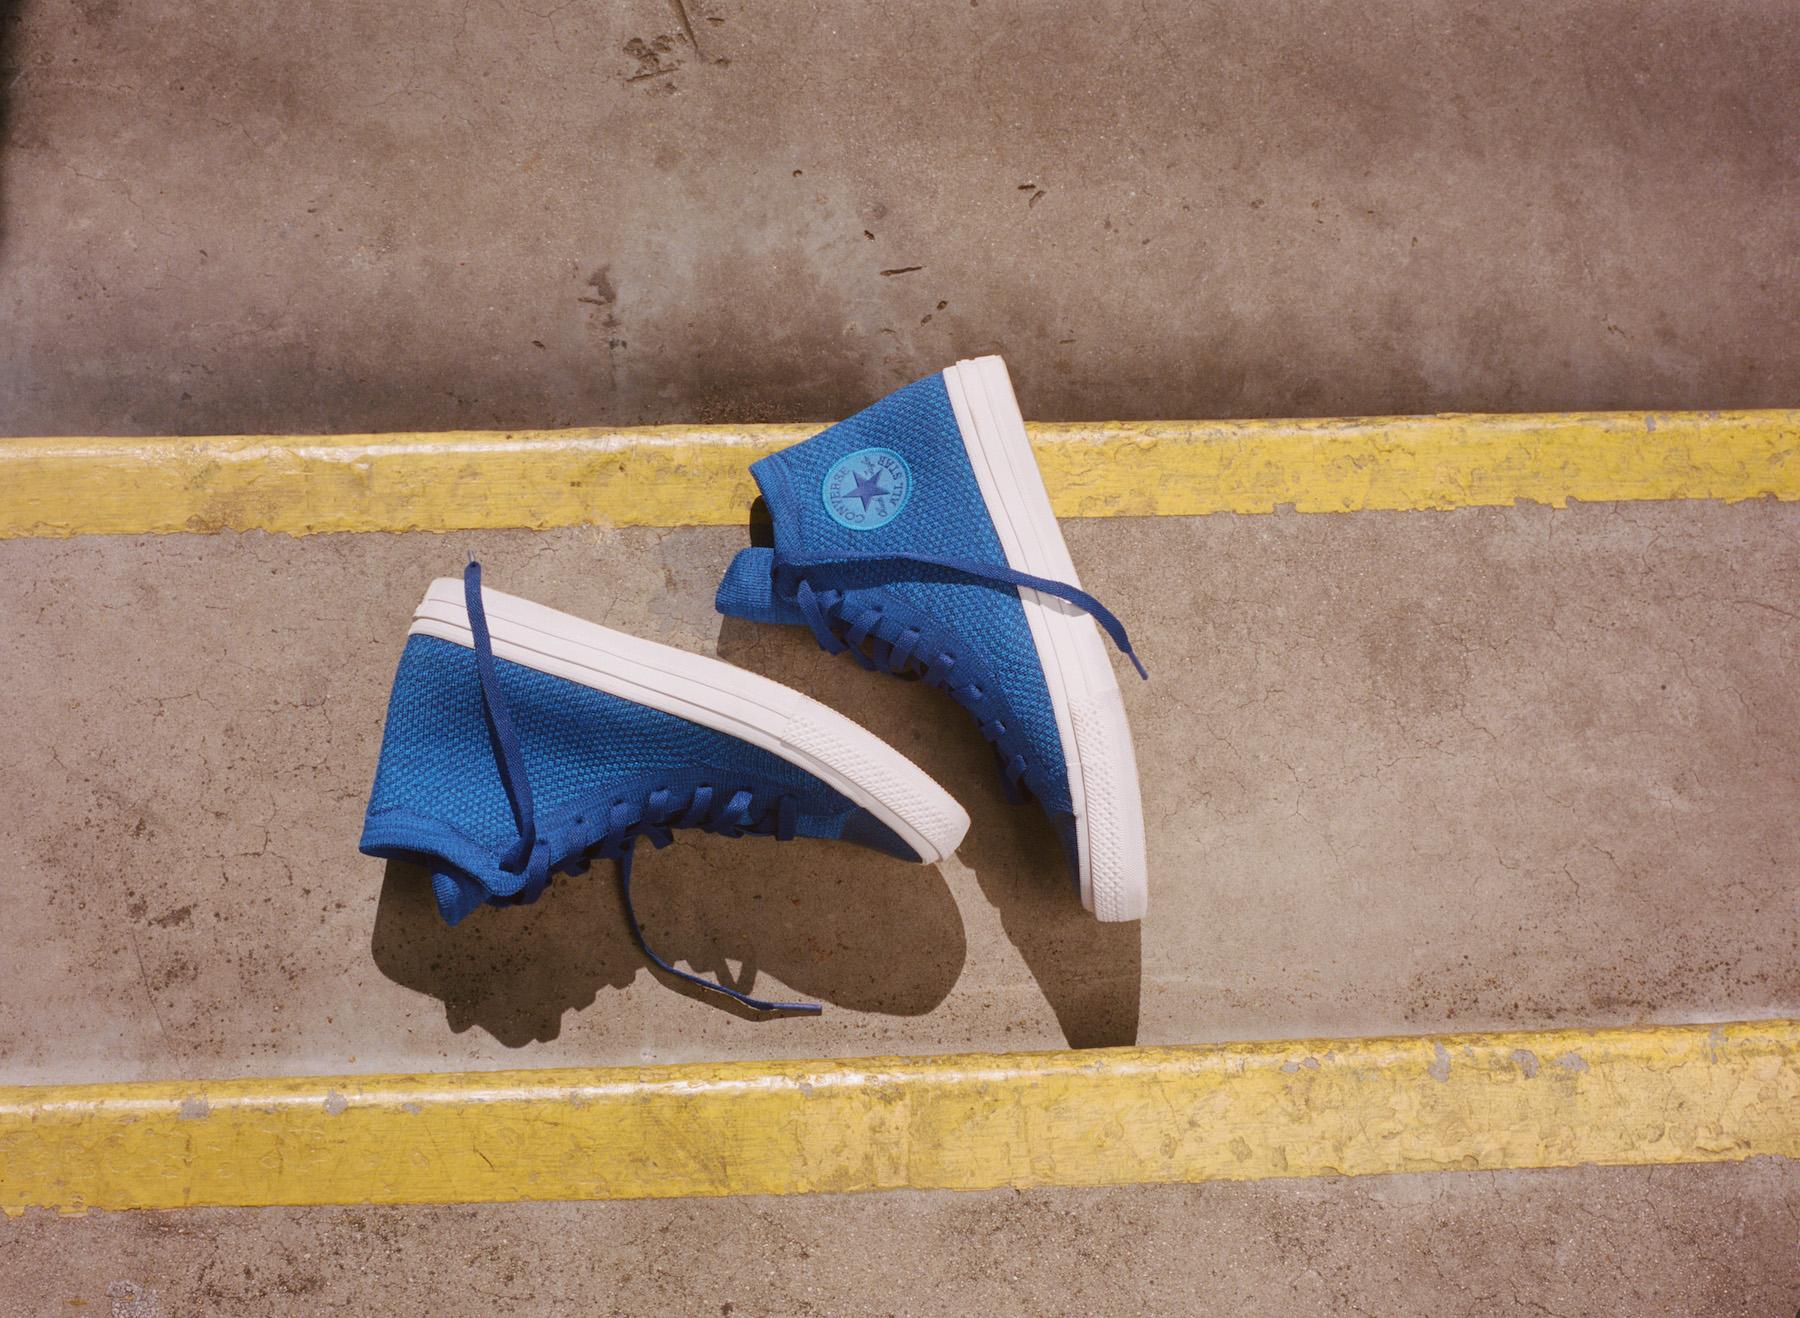 suelovesnyc_susan_fengler_blog_sneaker_converse_chuck_taylor_all_stars_x_nike_flyknit_koop